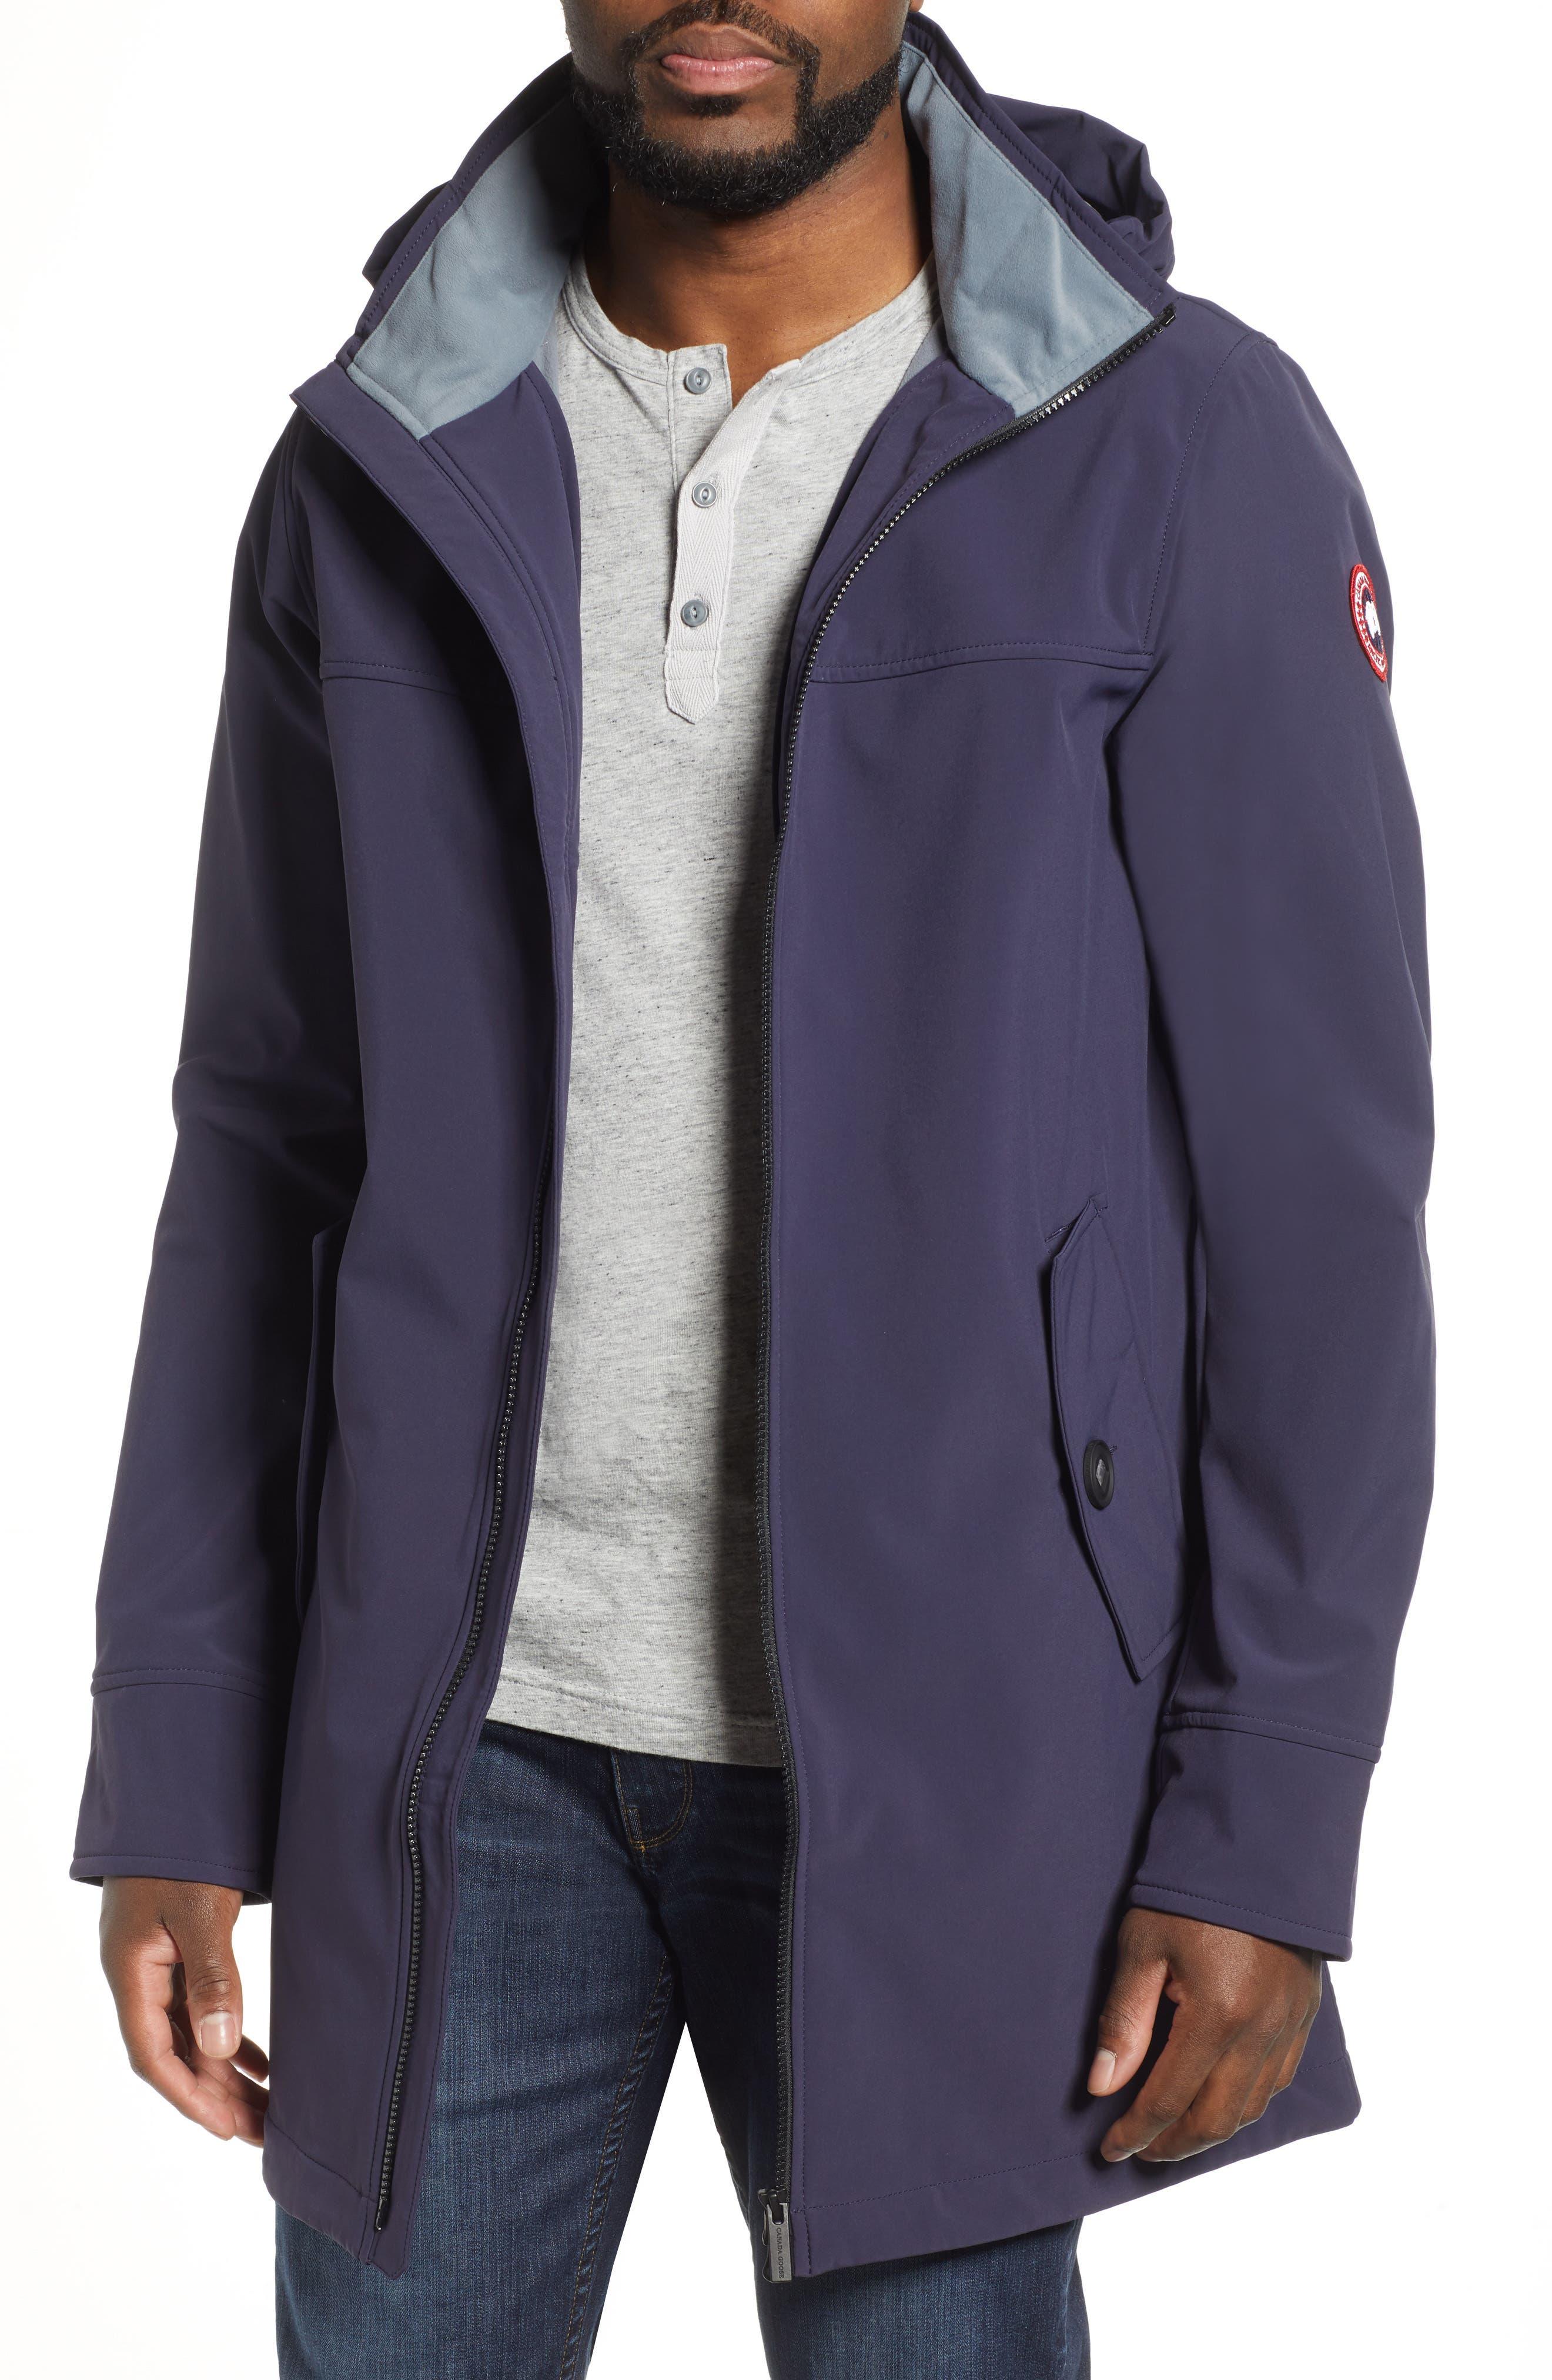 canada goose jacket 3xl